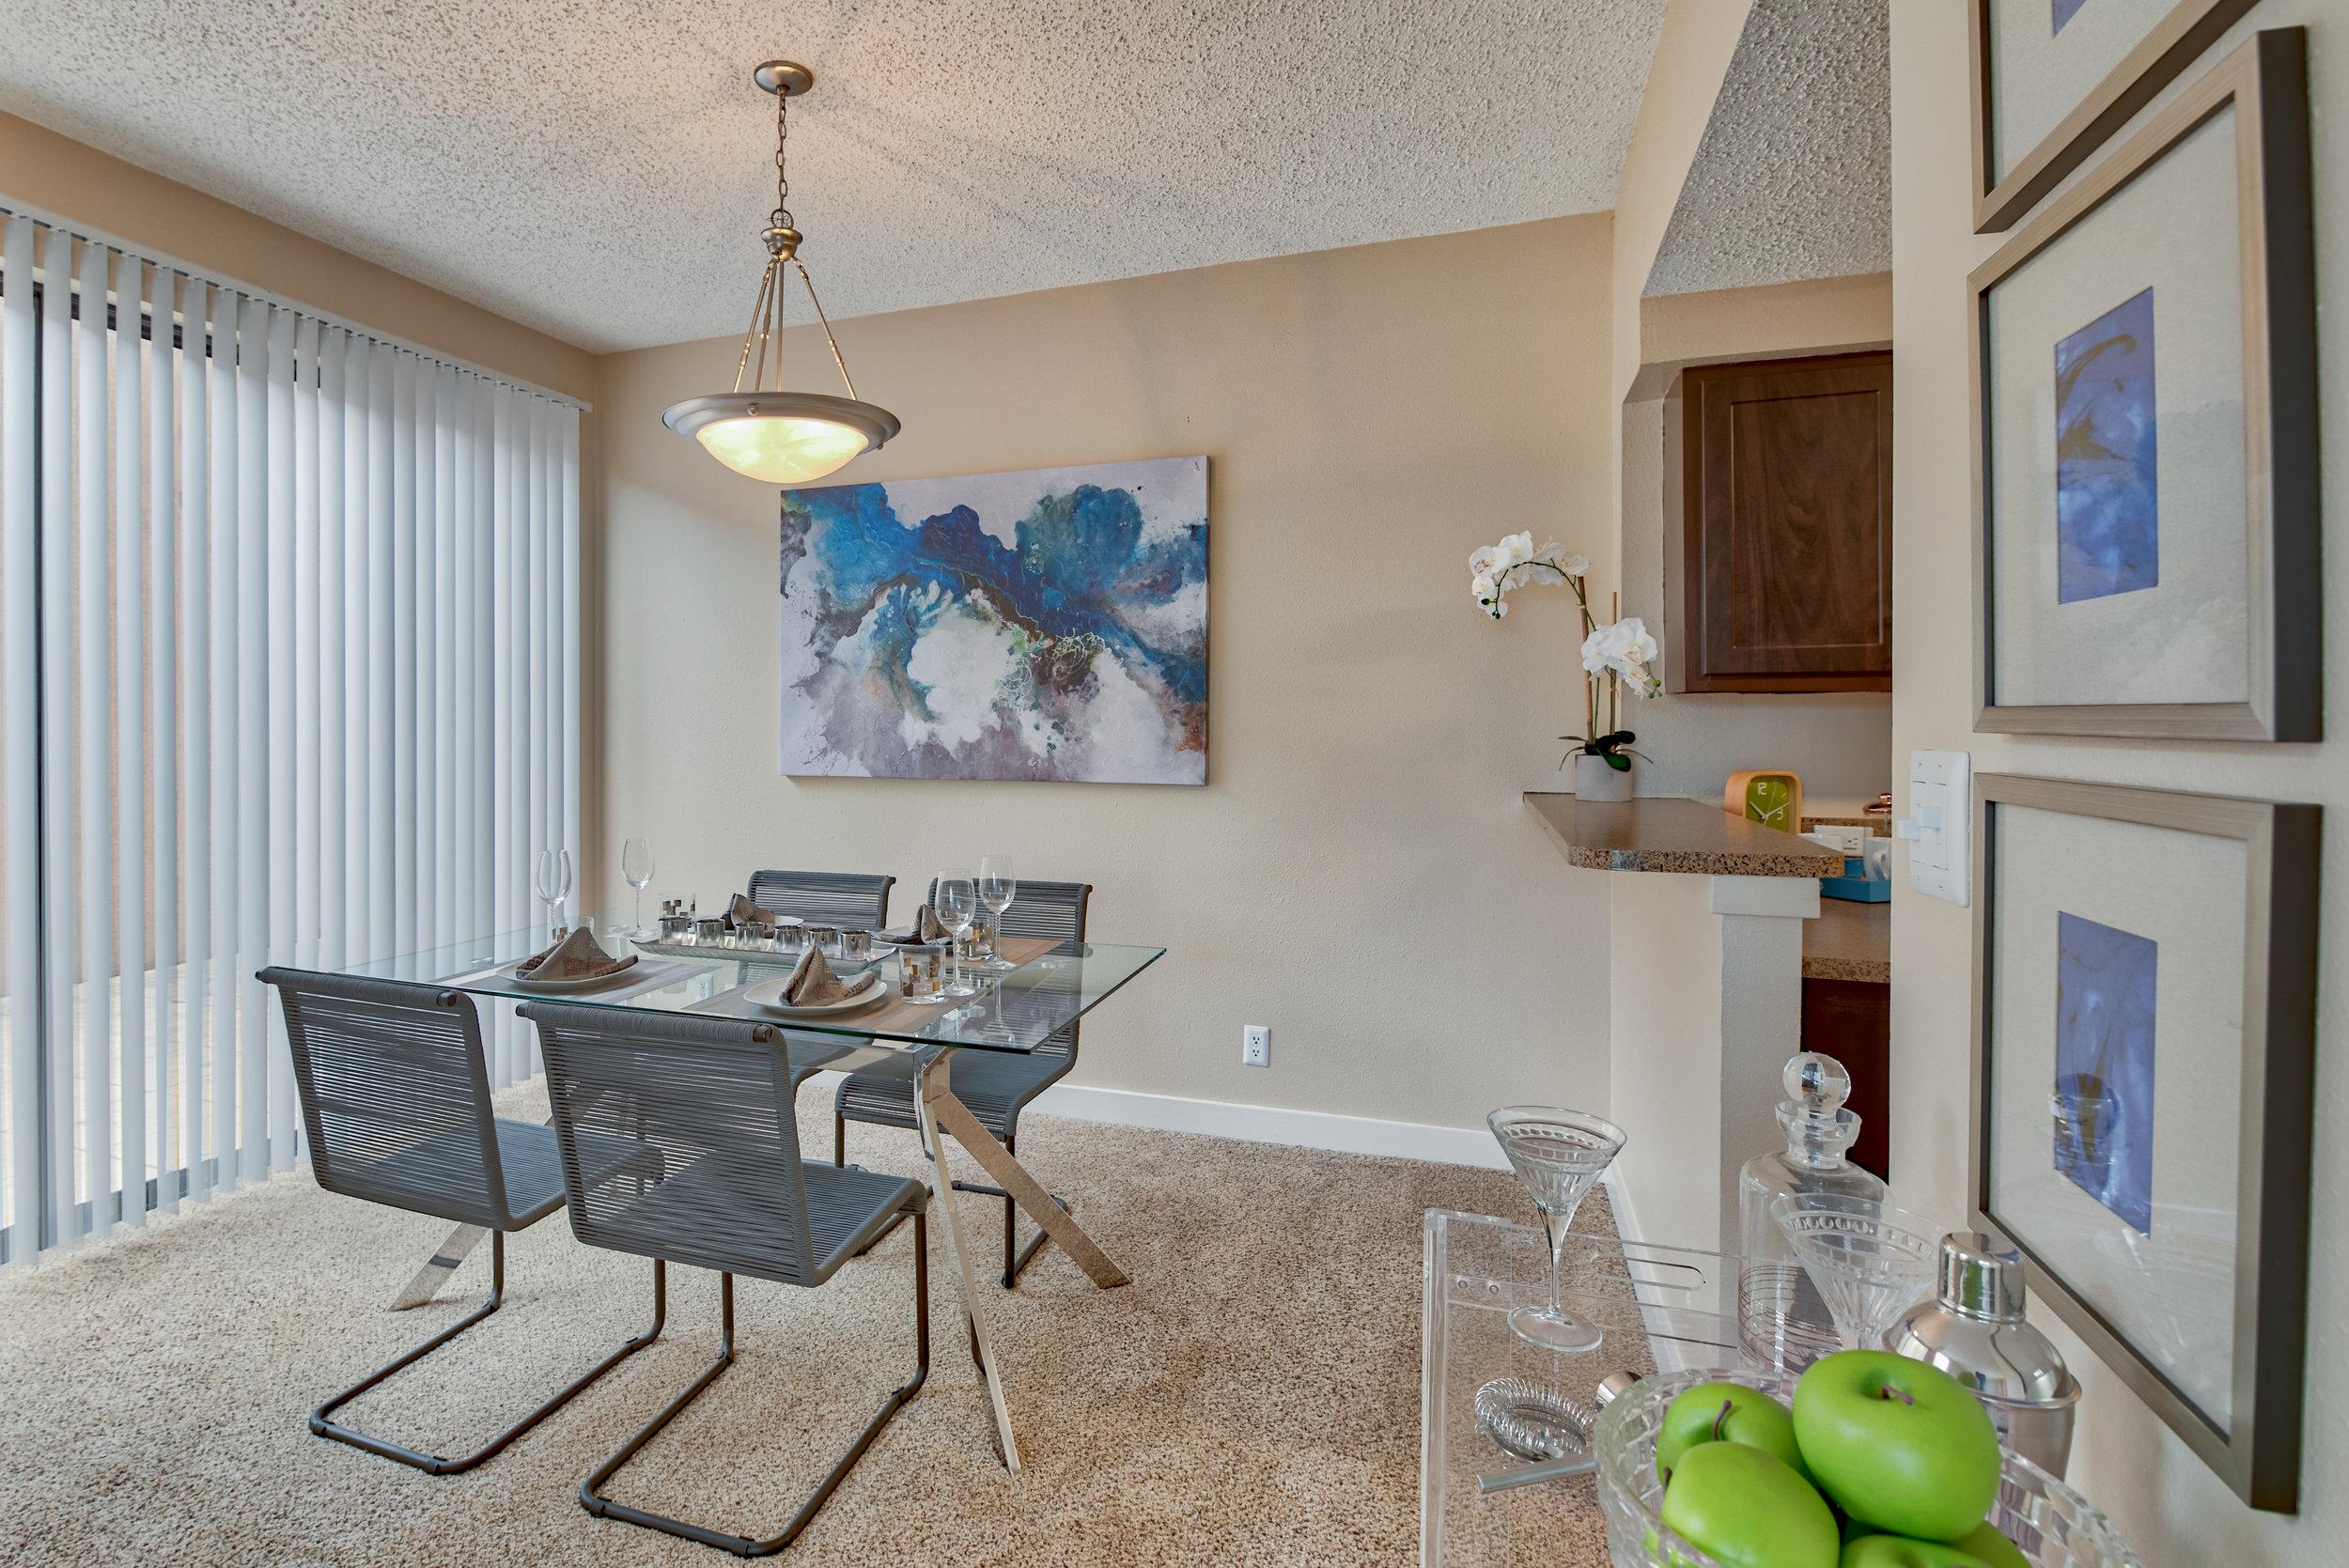 Dining-Room_Enclave-at-1550_1550-Jackson-Keller-Rd-San-Antonio-TX_RPI_PJ04491_29.jpg